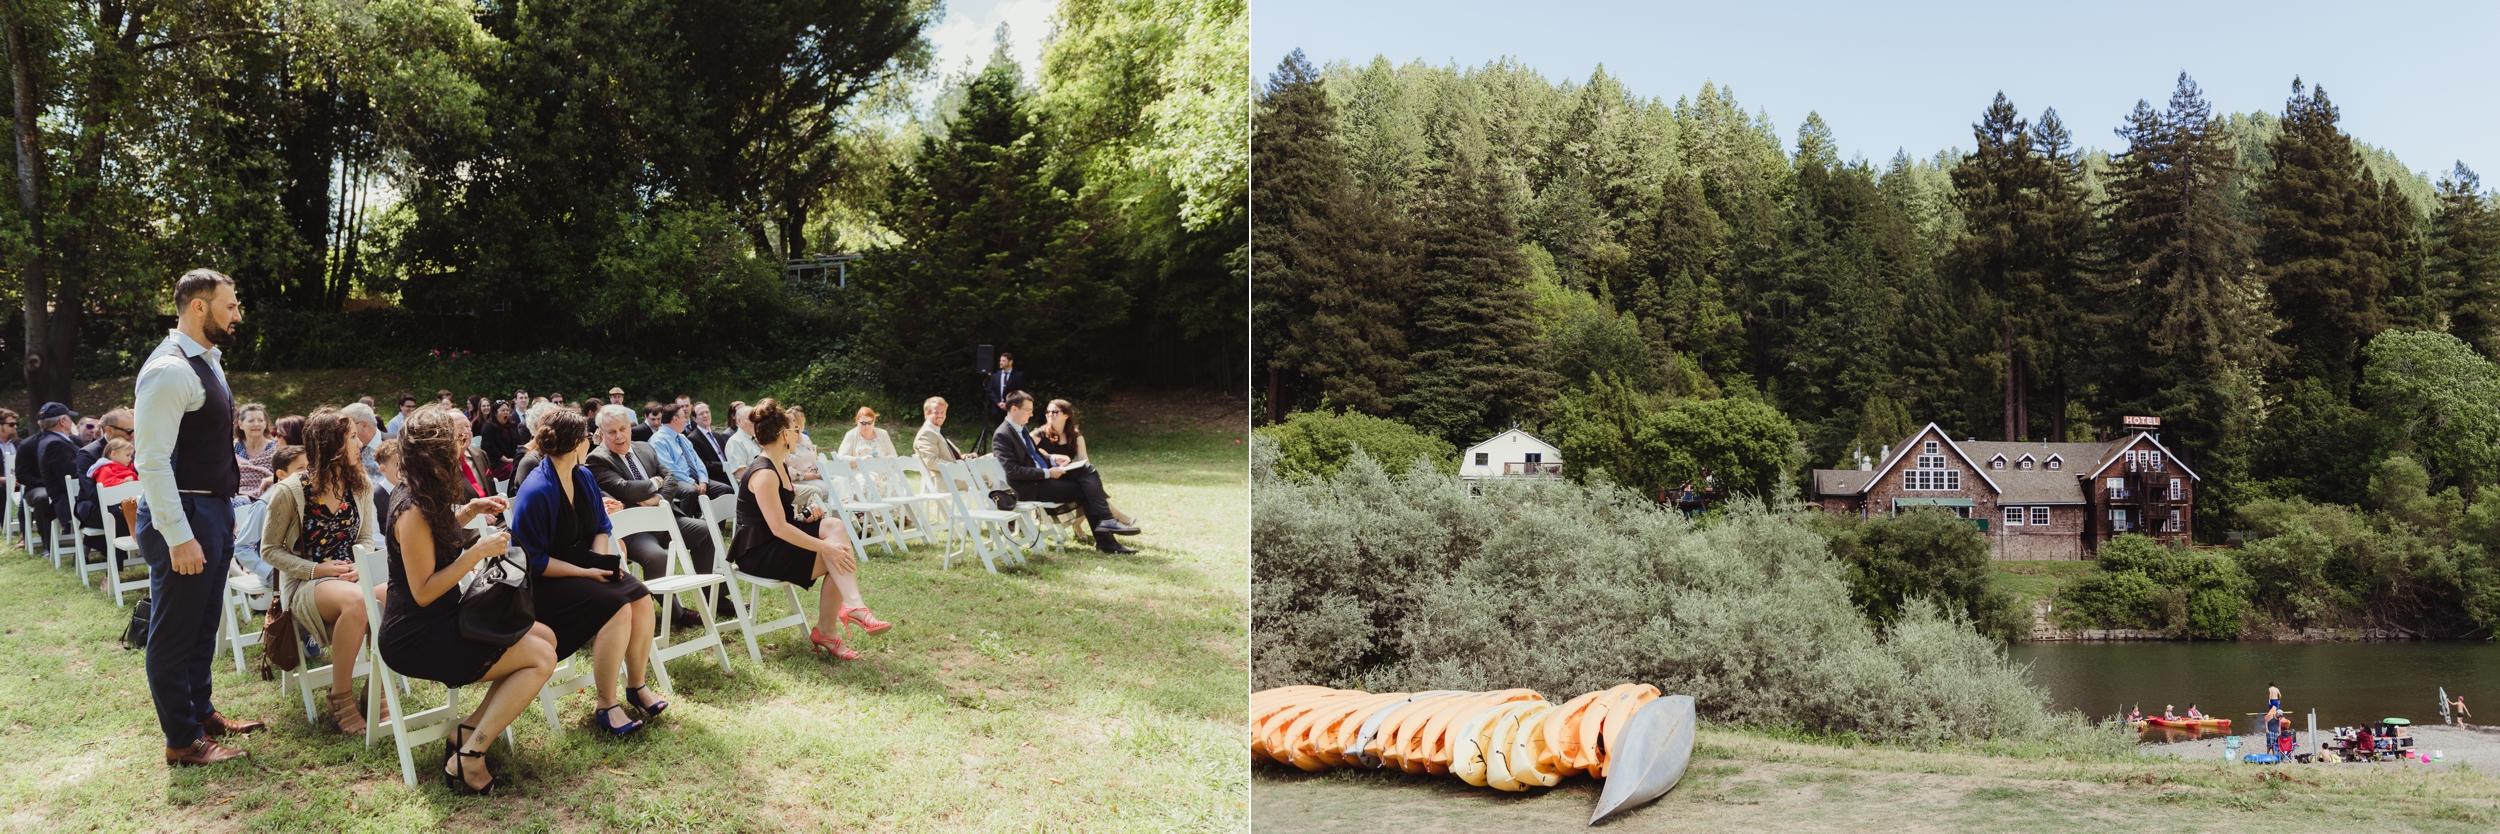 027-highland-dell-lodge-russian-river-wedding-vivianchen-142_WEB.jpg